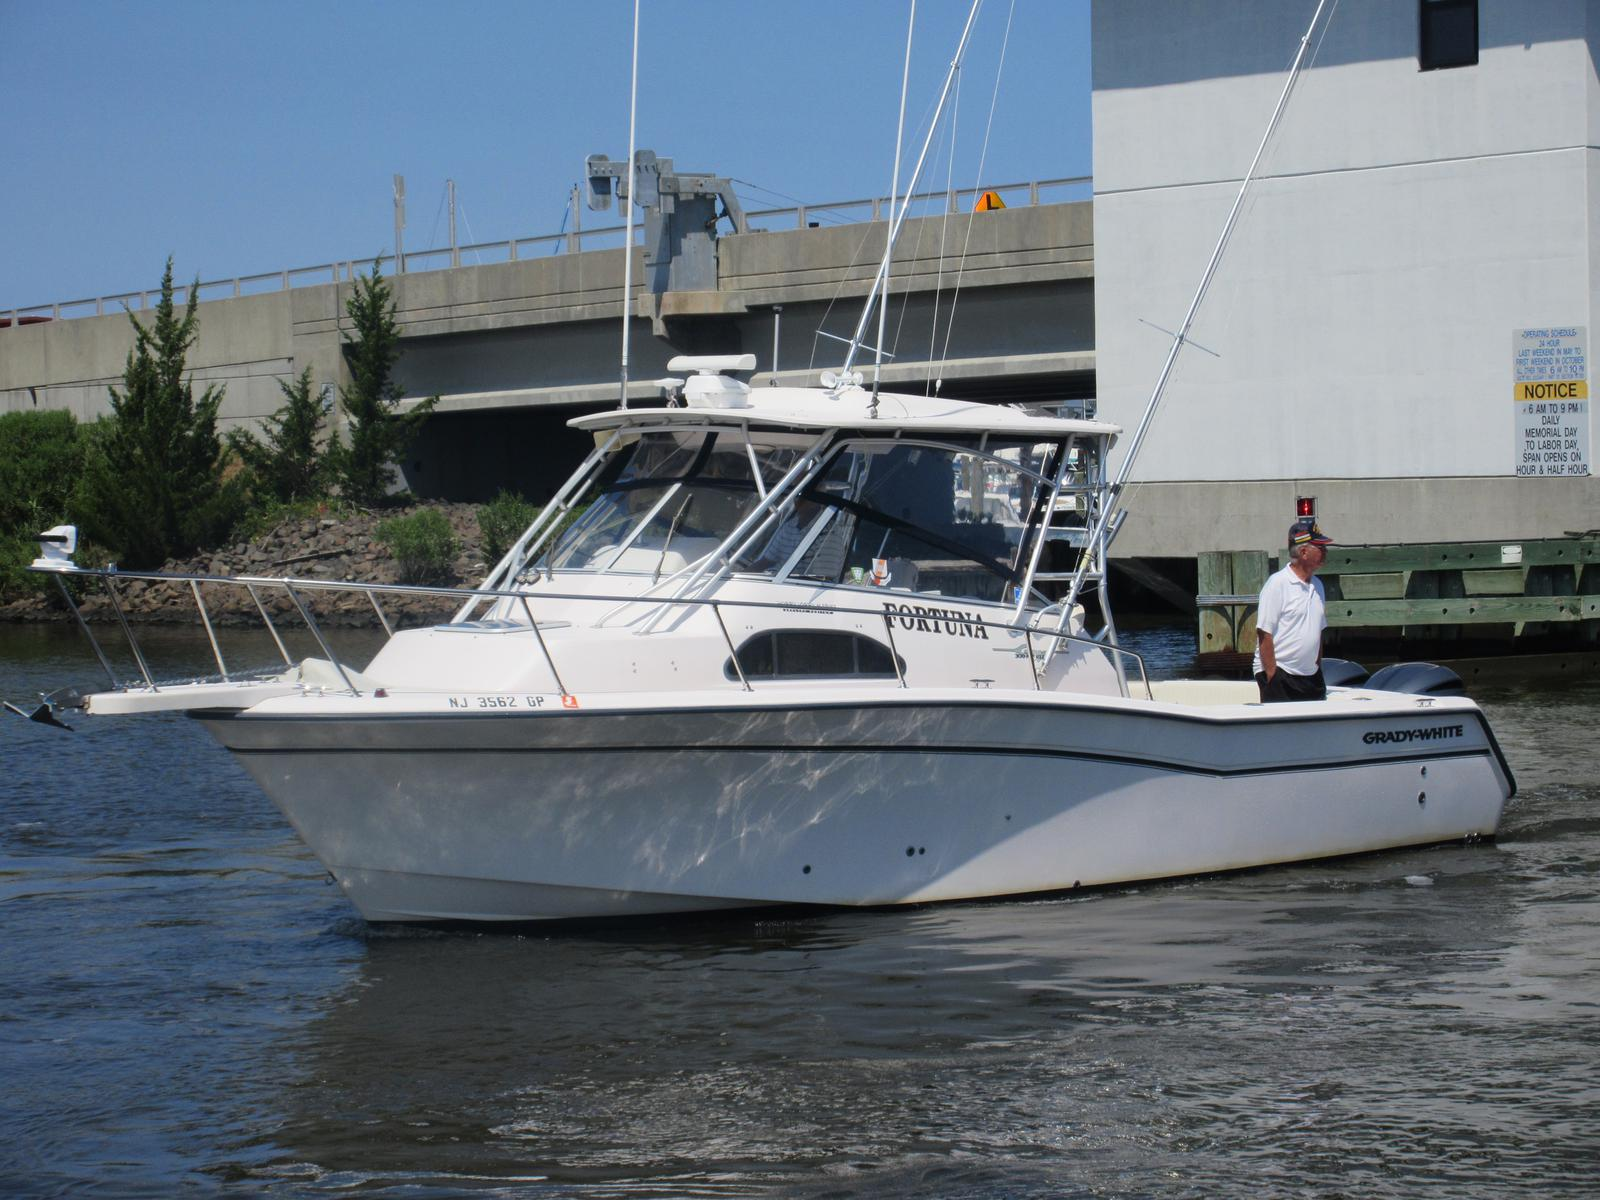 Inventory from Grady-White Comstock Yacht Sales & Marina